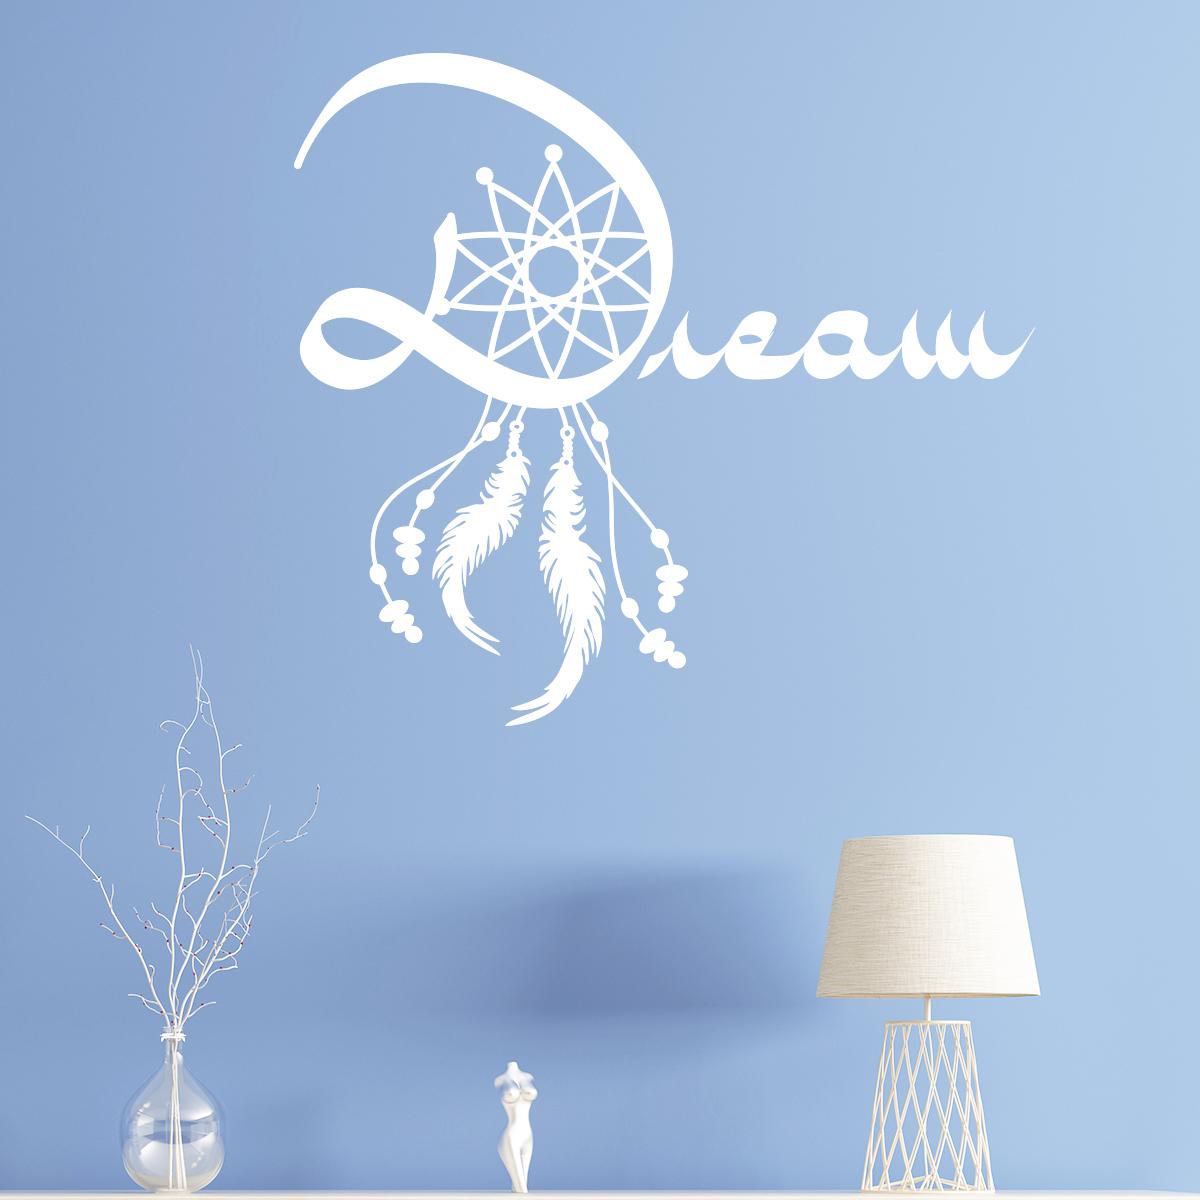 sticker attrape r ve dream stickers art et design artistiques ambiance sticker. Black Bedroom Furniture Sets. Home Design Ideas